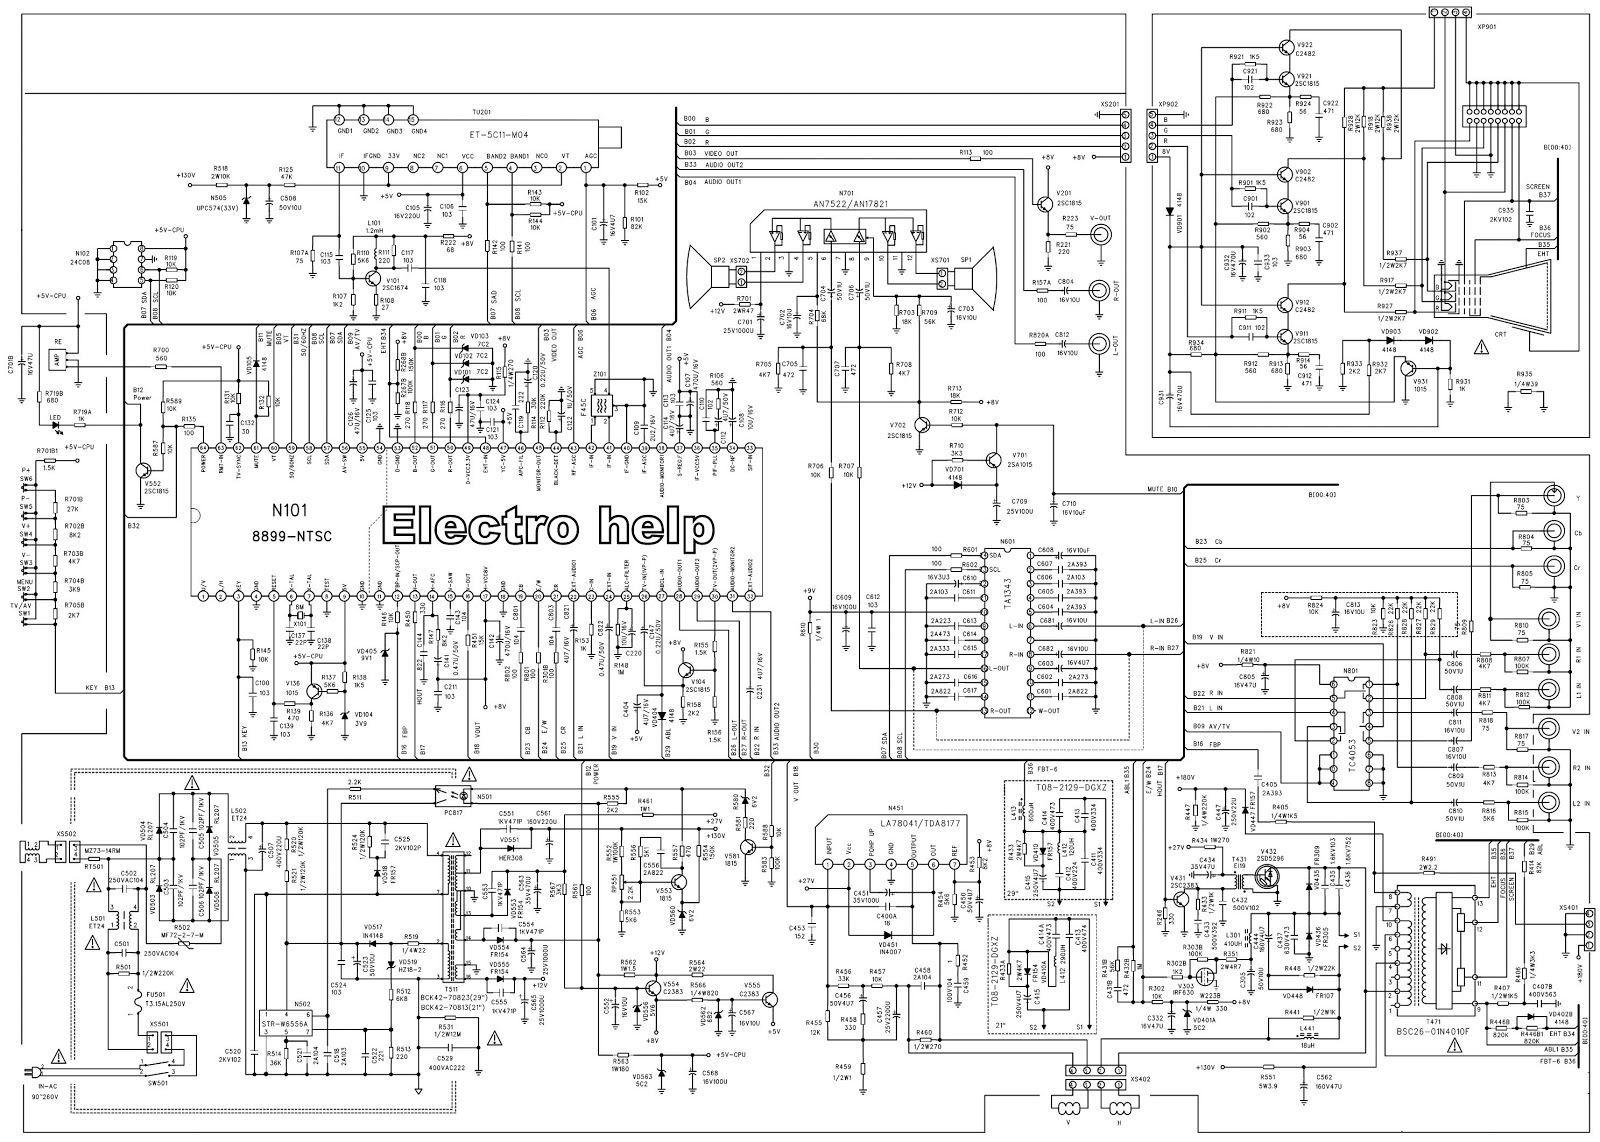 1995 Nissan 240sx Wiring Diagram Free Picture Diagram Source Circuit Diagram Circuit Board Design Crt Tv